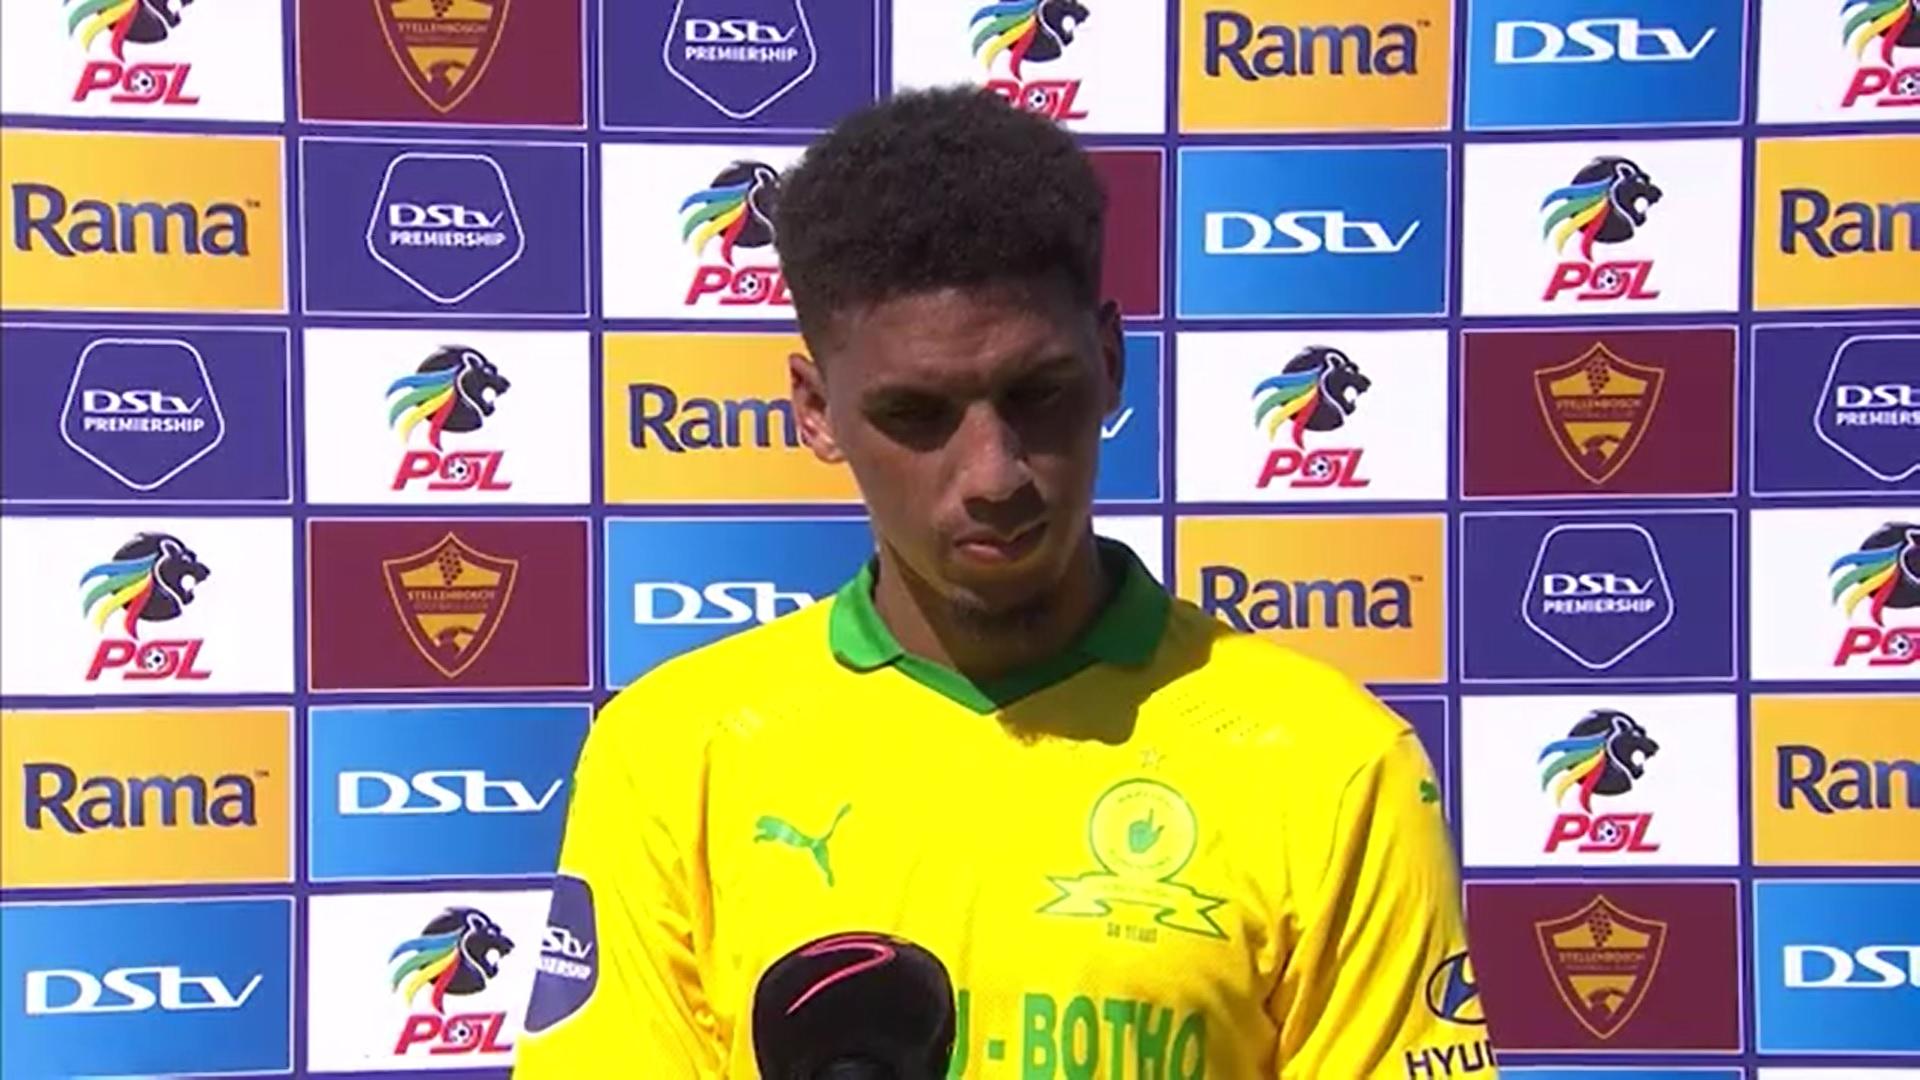 DStv Premiership | Stellenbosch FC v Mamelodi Sundowns | Post-match interview with Rushine De Reuck